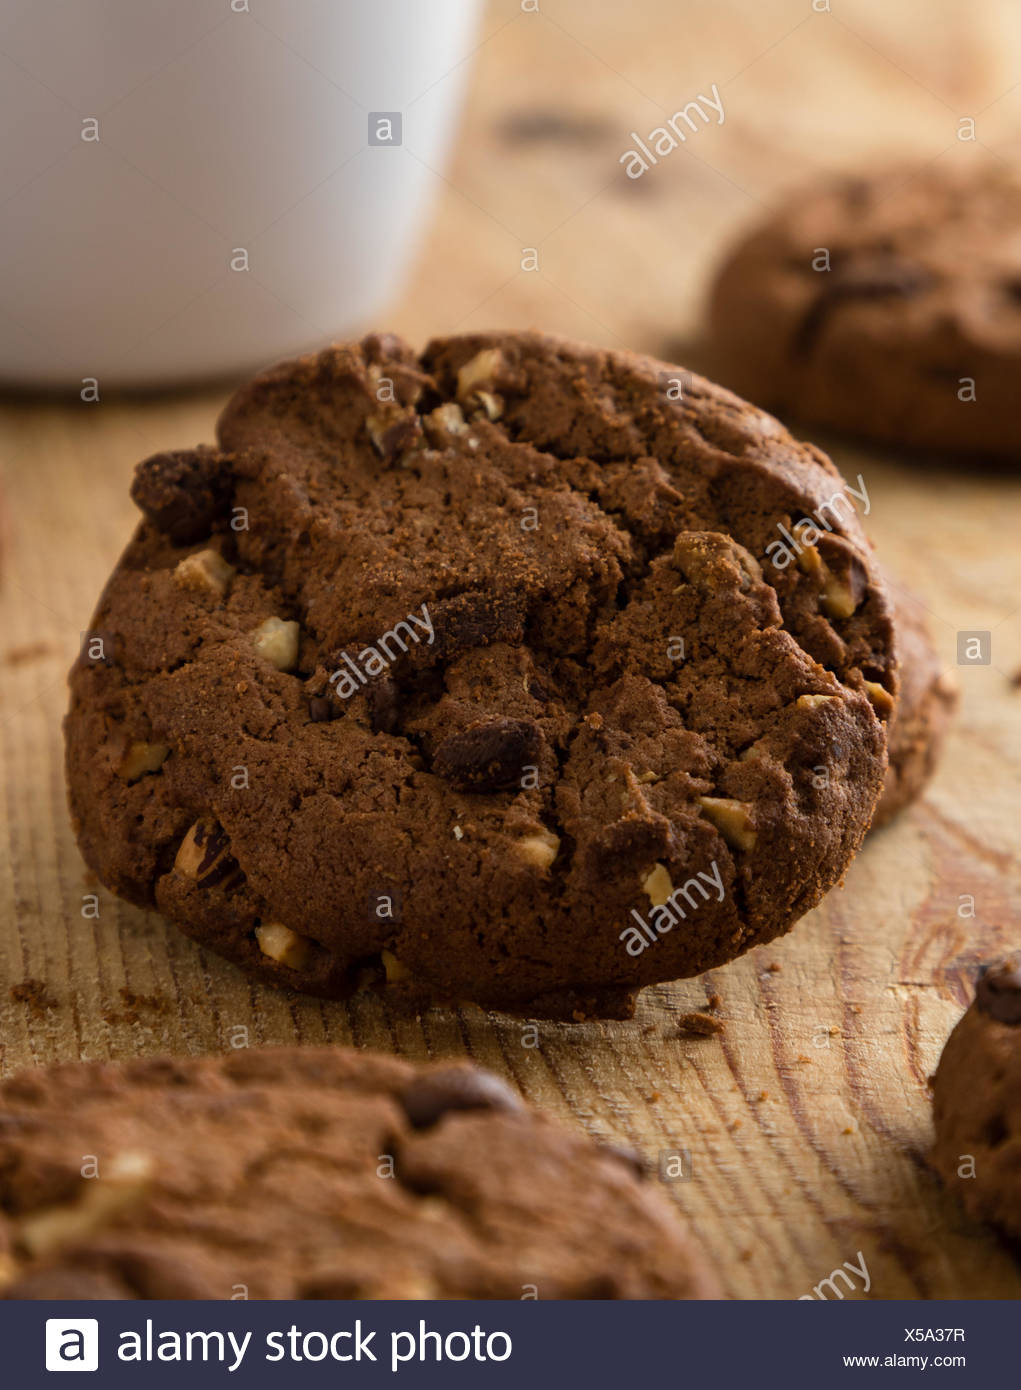 chocolate biscuit cookies - Stock Image